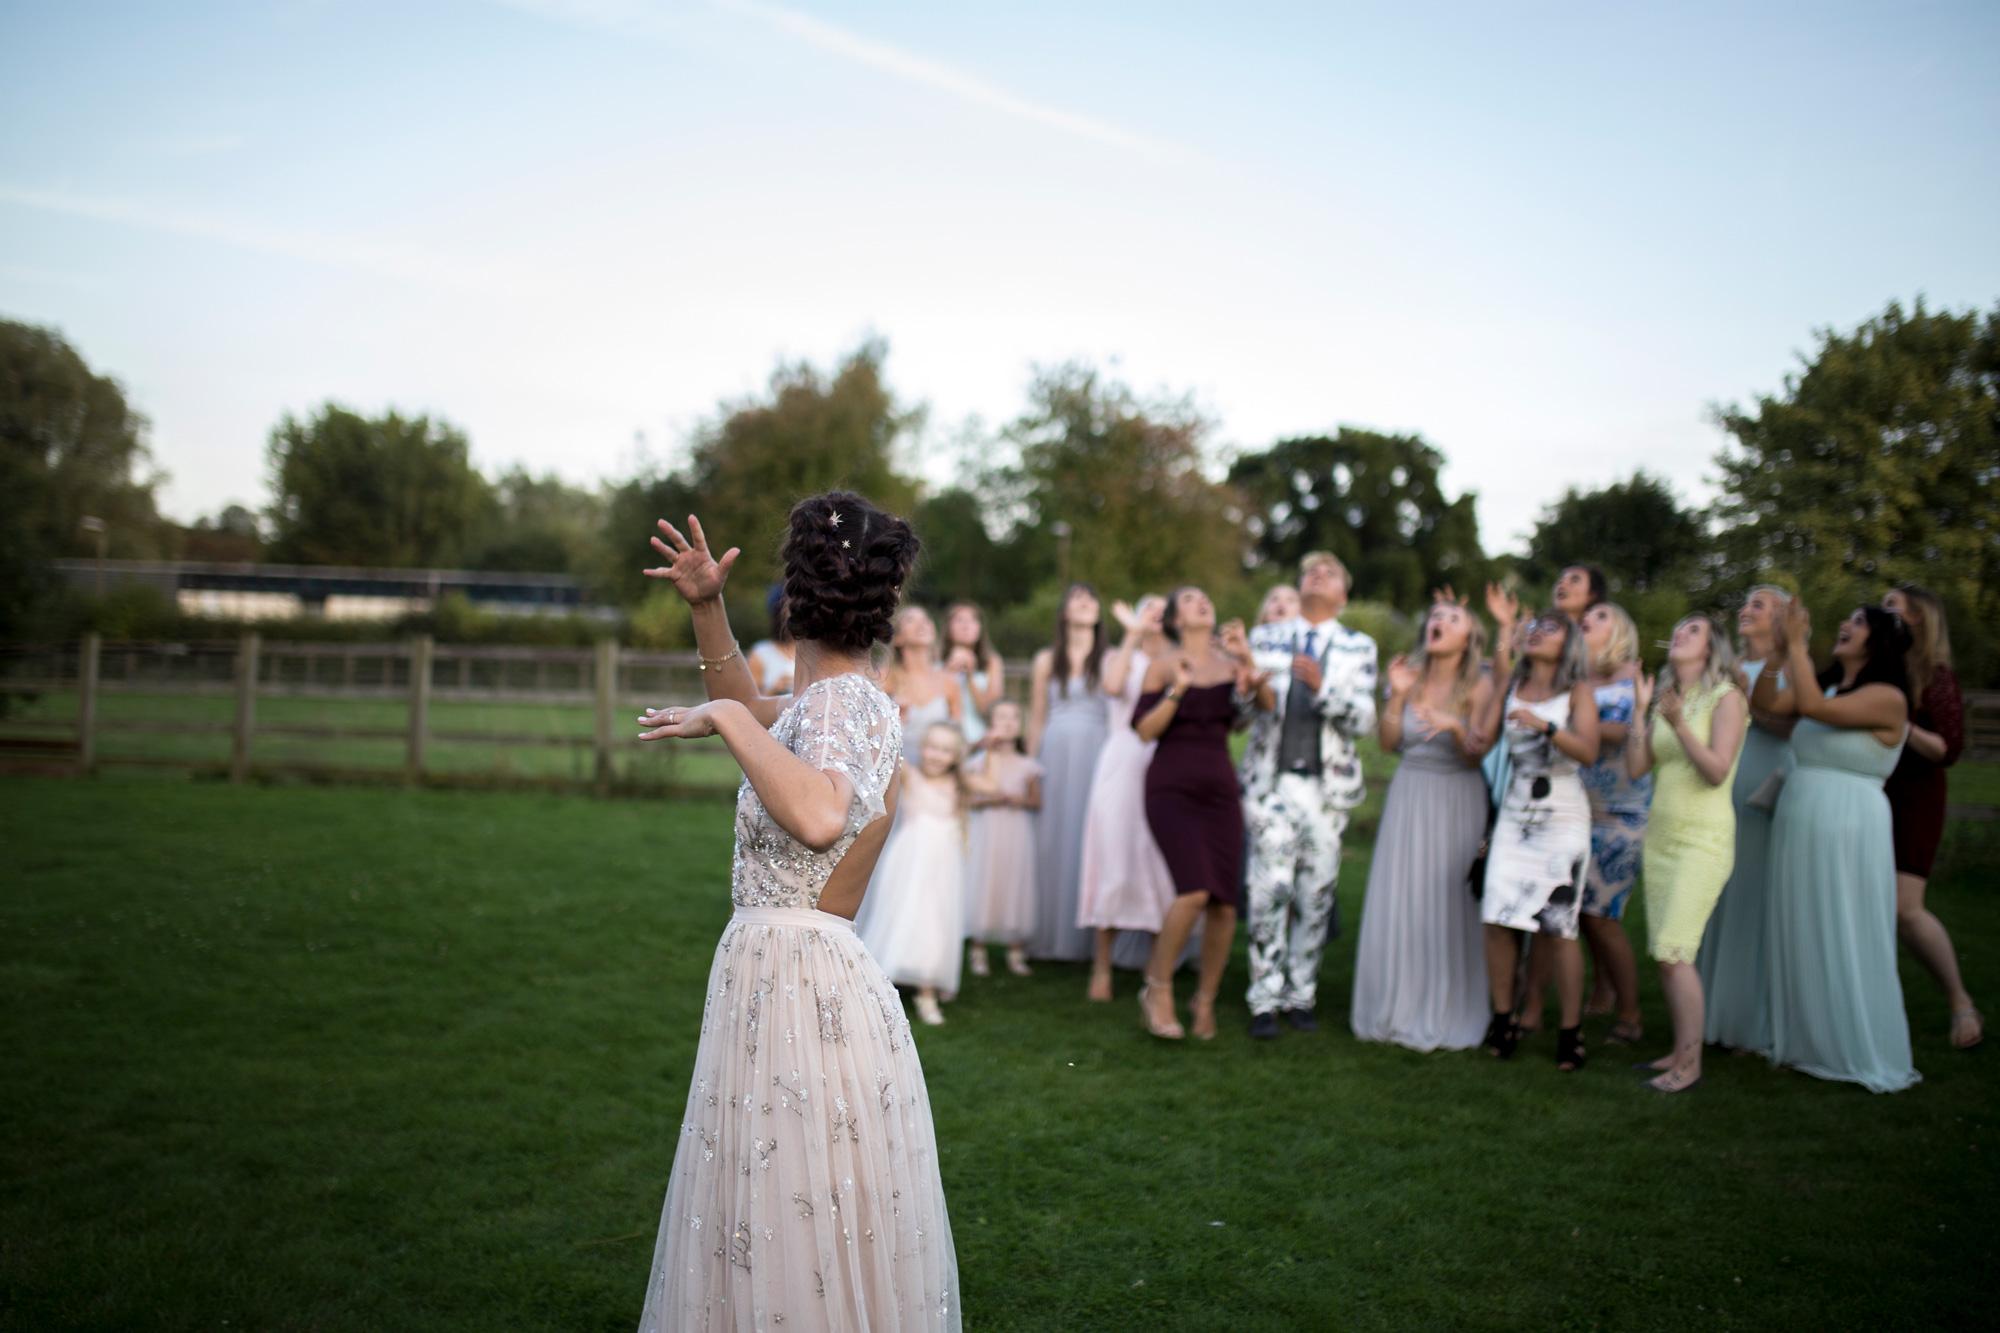 bride throwing bouquet wedding photo.jpg